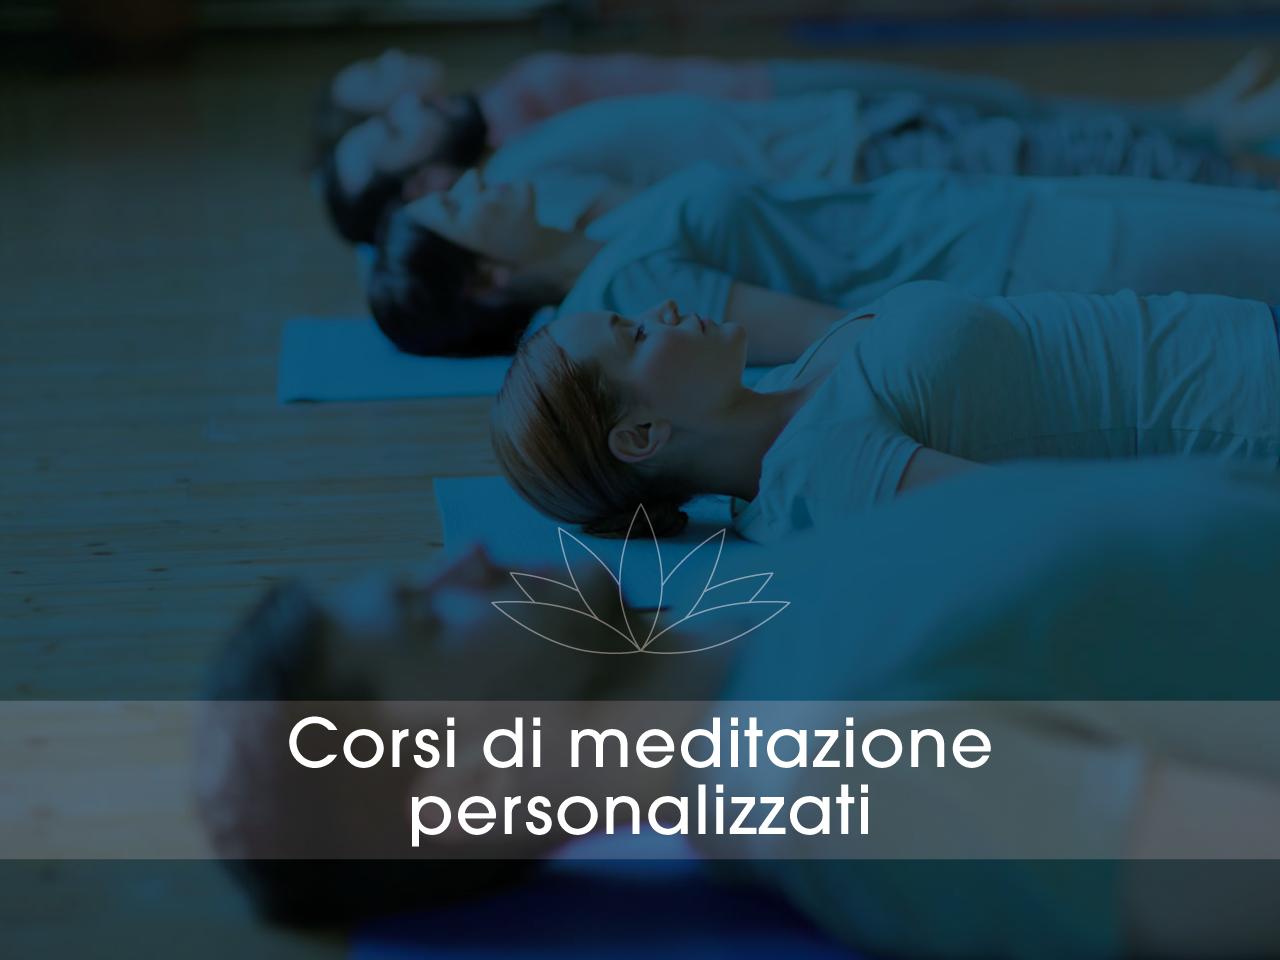 https://meditaedanza.com/wp-content/uploads/2020/12/corsi-personalizzati-gruppi-meditazione-2.png